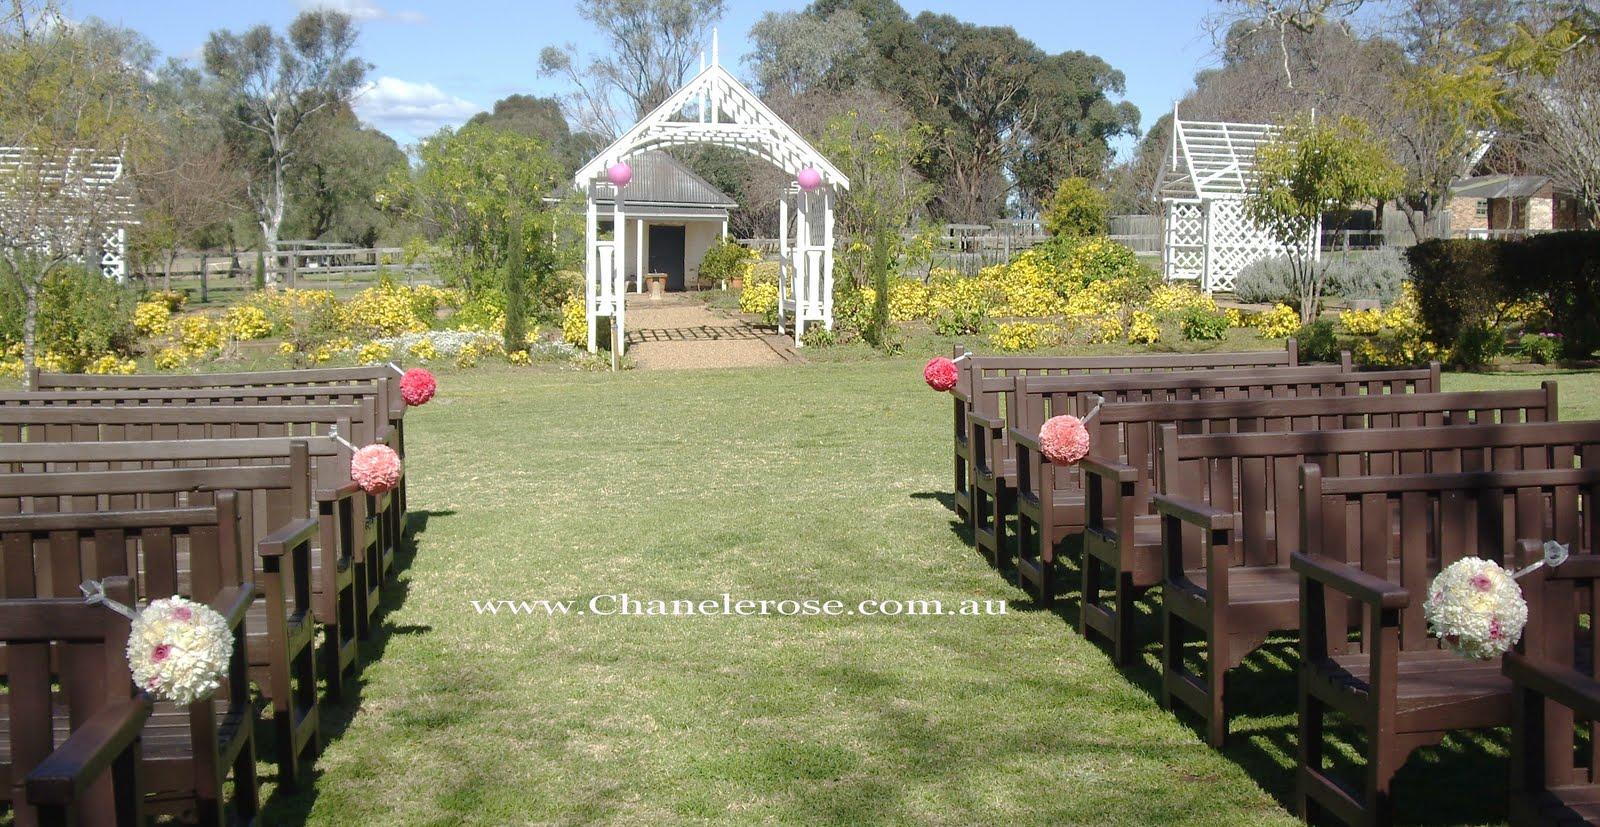 Gorgeous Wedding Ceremonies: Chanele Rose Flowers Blog- Sydney Wedding Stylist